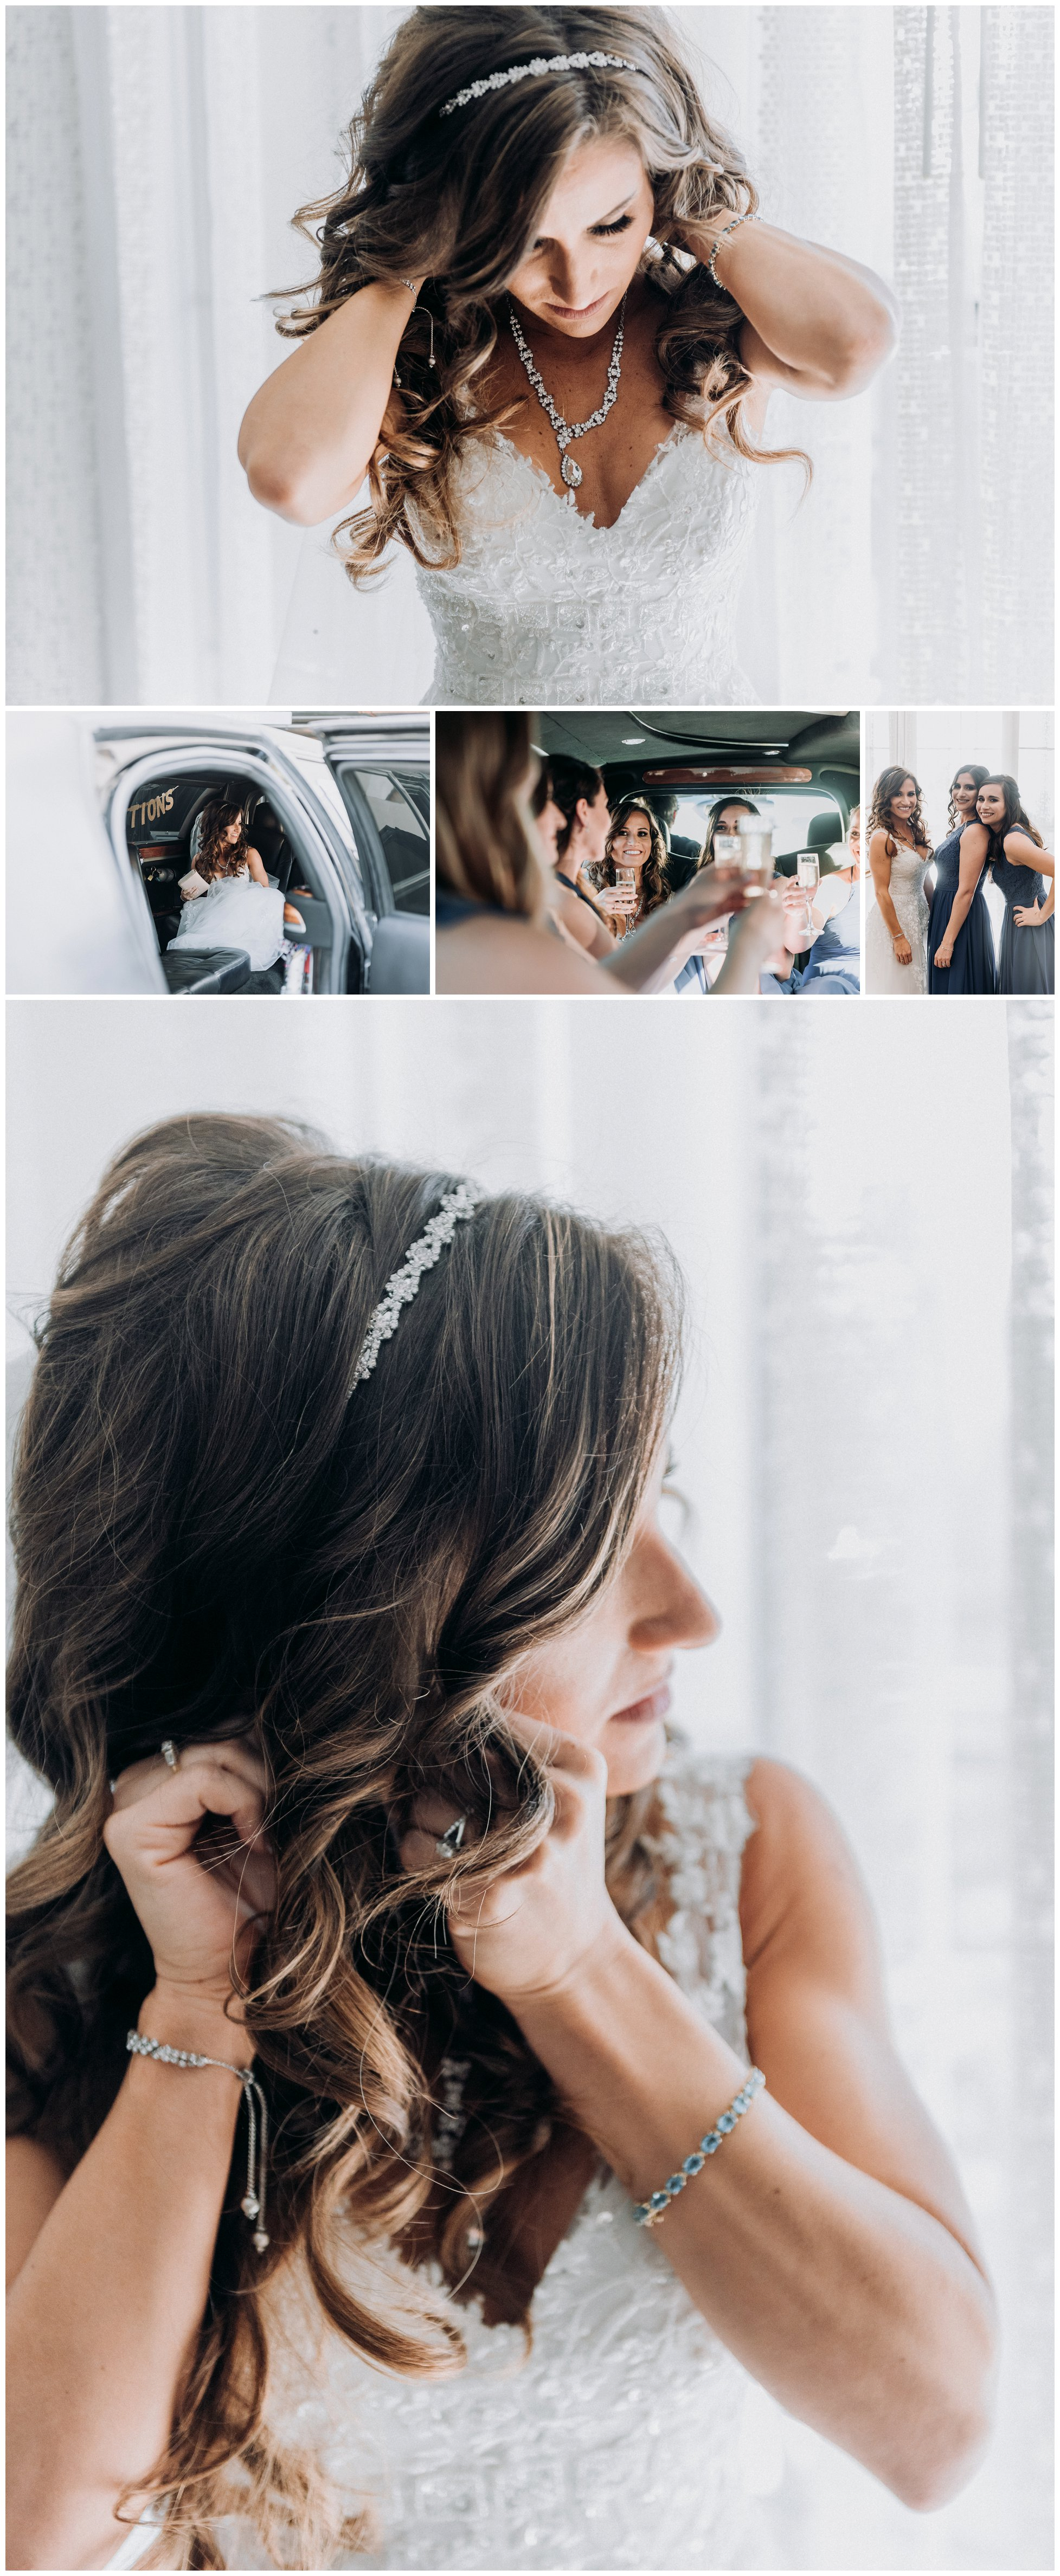 Electra Cruises Wedding Photography - Saundra + Michael_0004.jpg